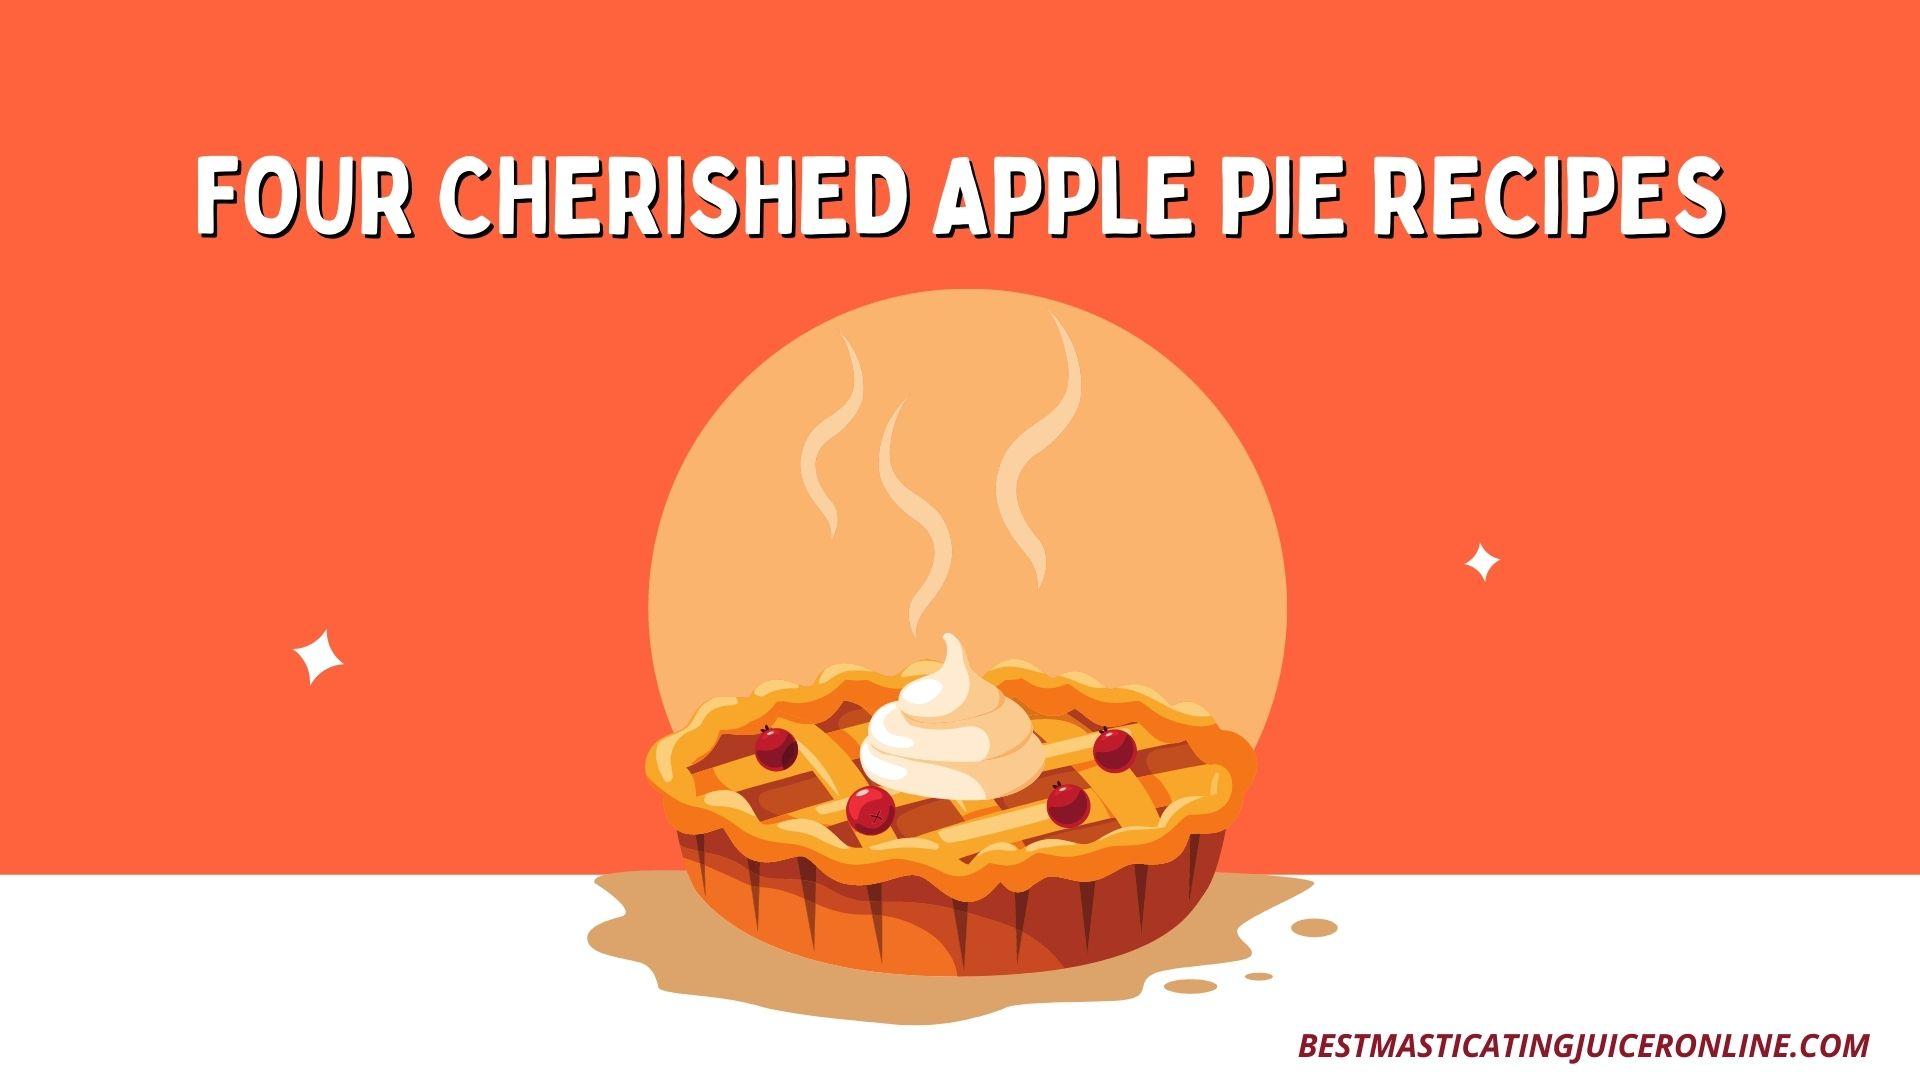 Four Cherished Apple Pie Recipes